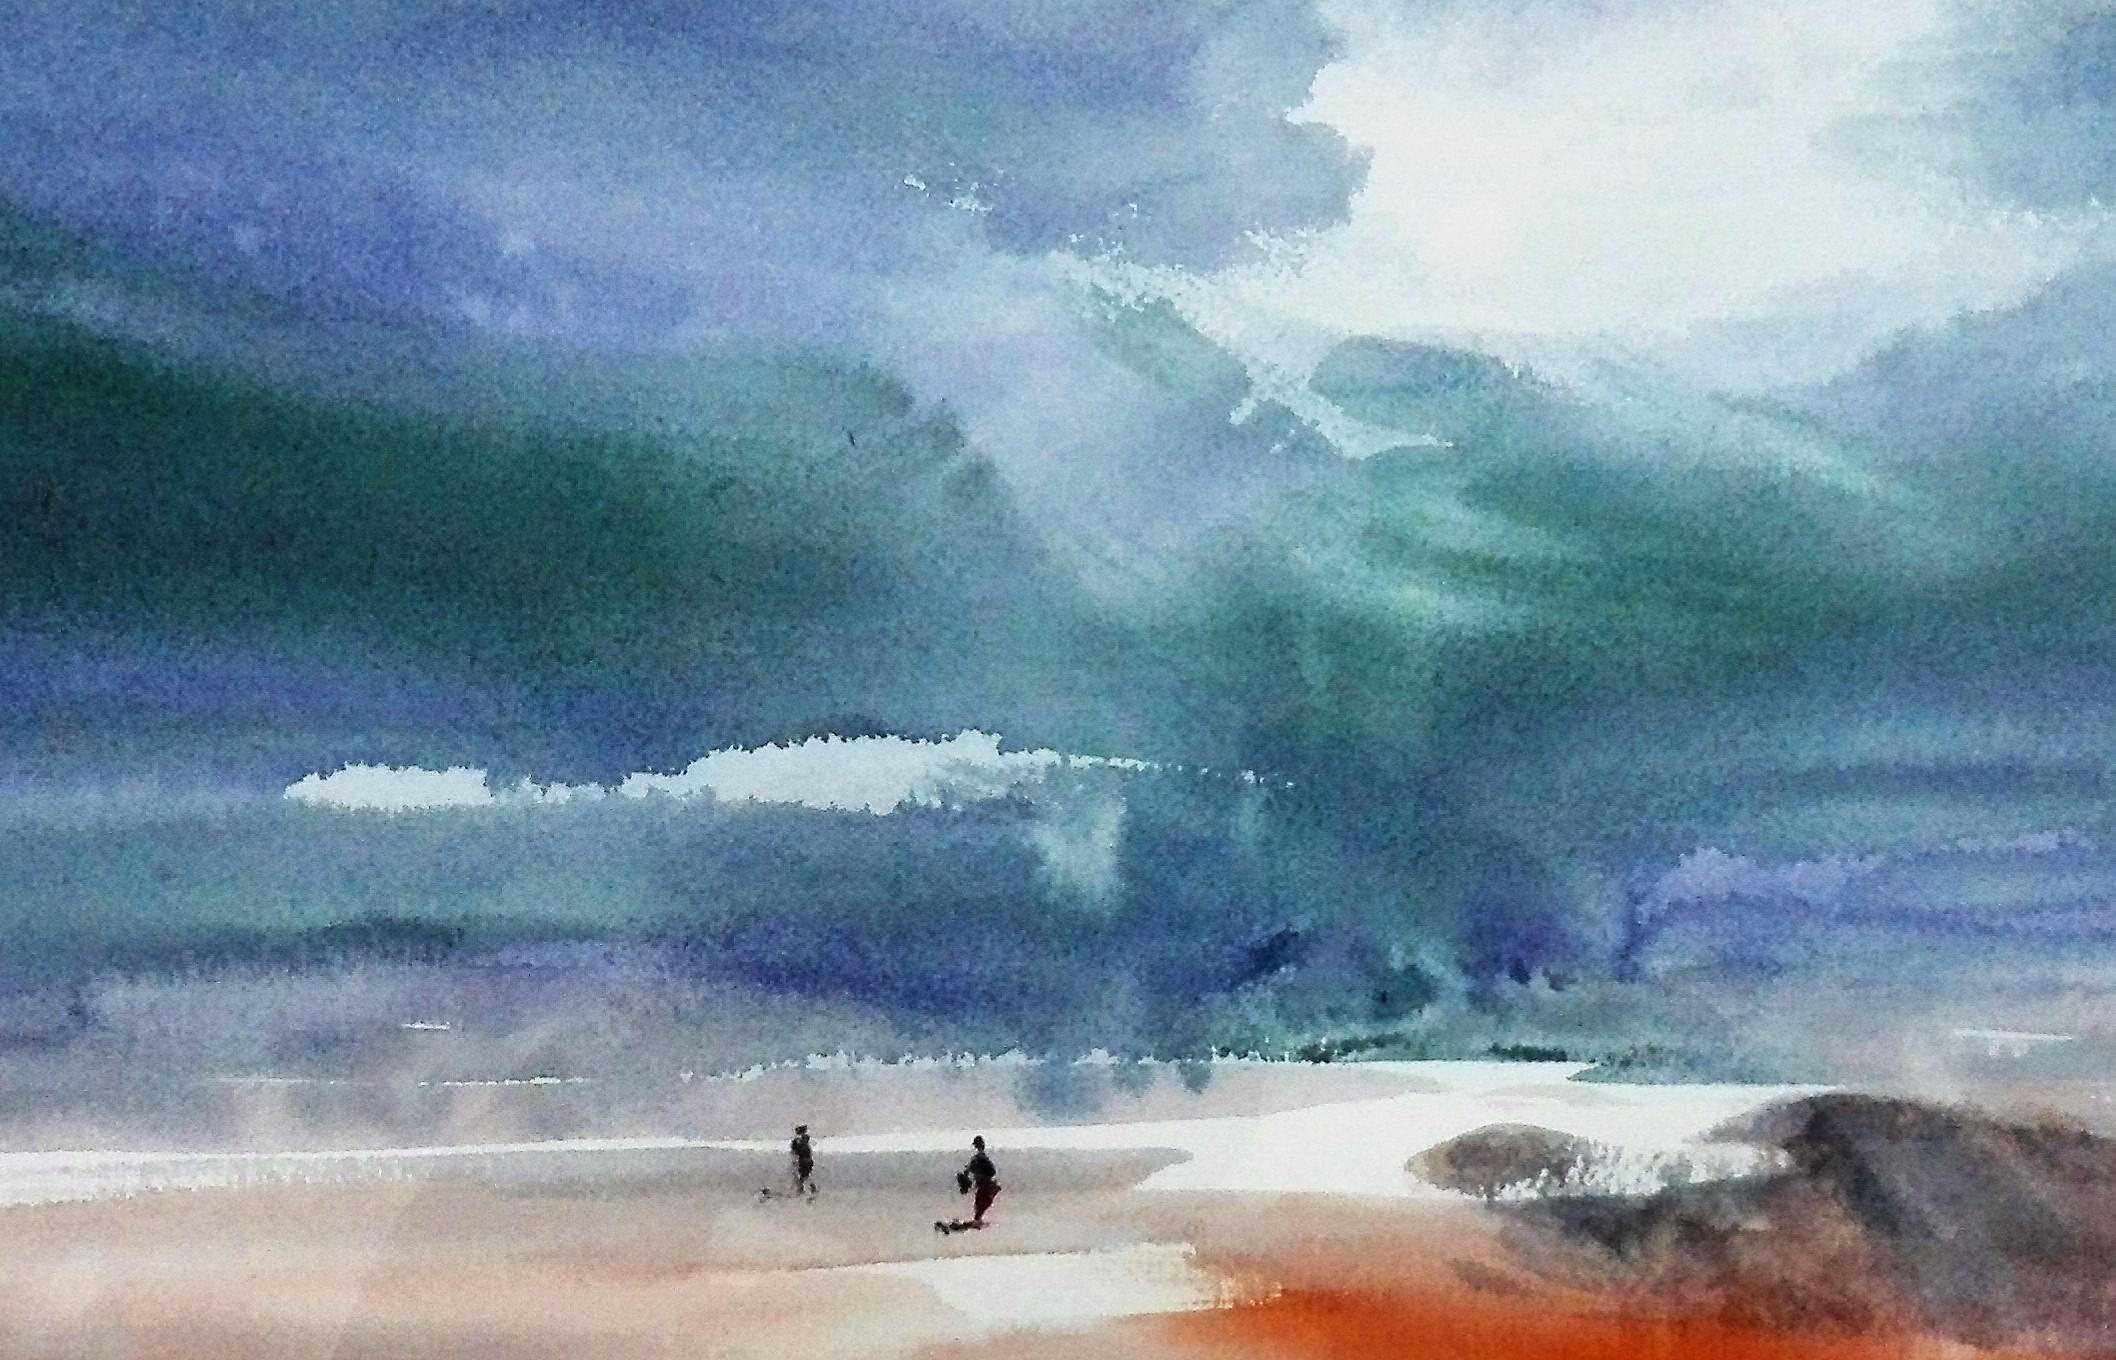 Playa Solitaria (2016) - Pablo Reviriego